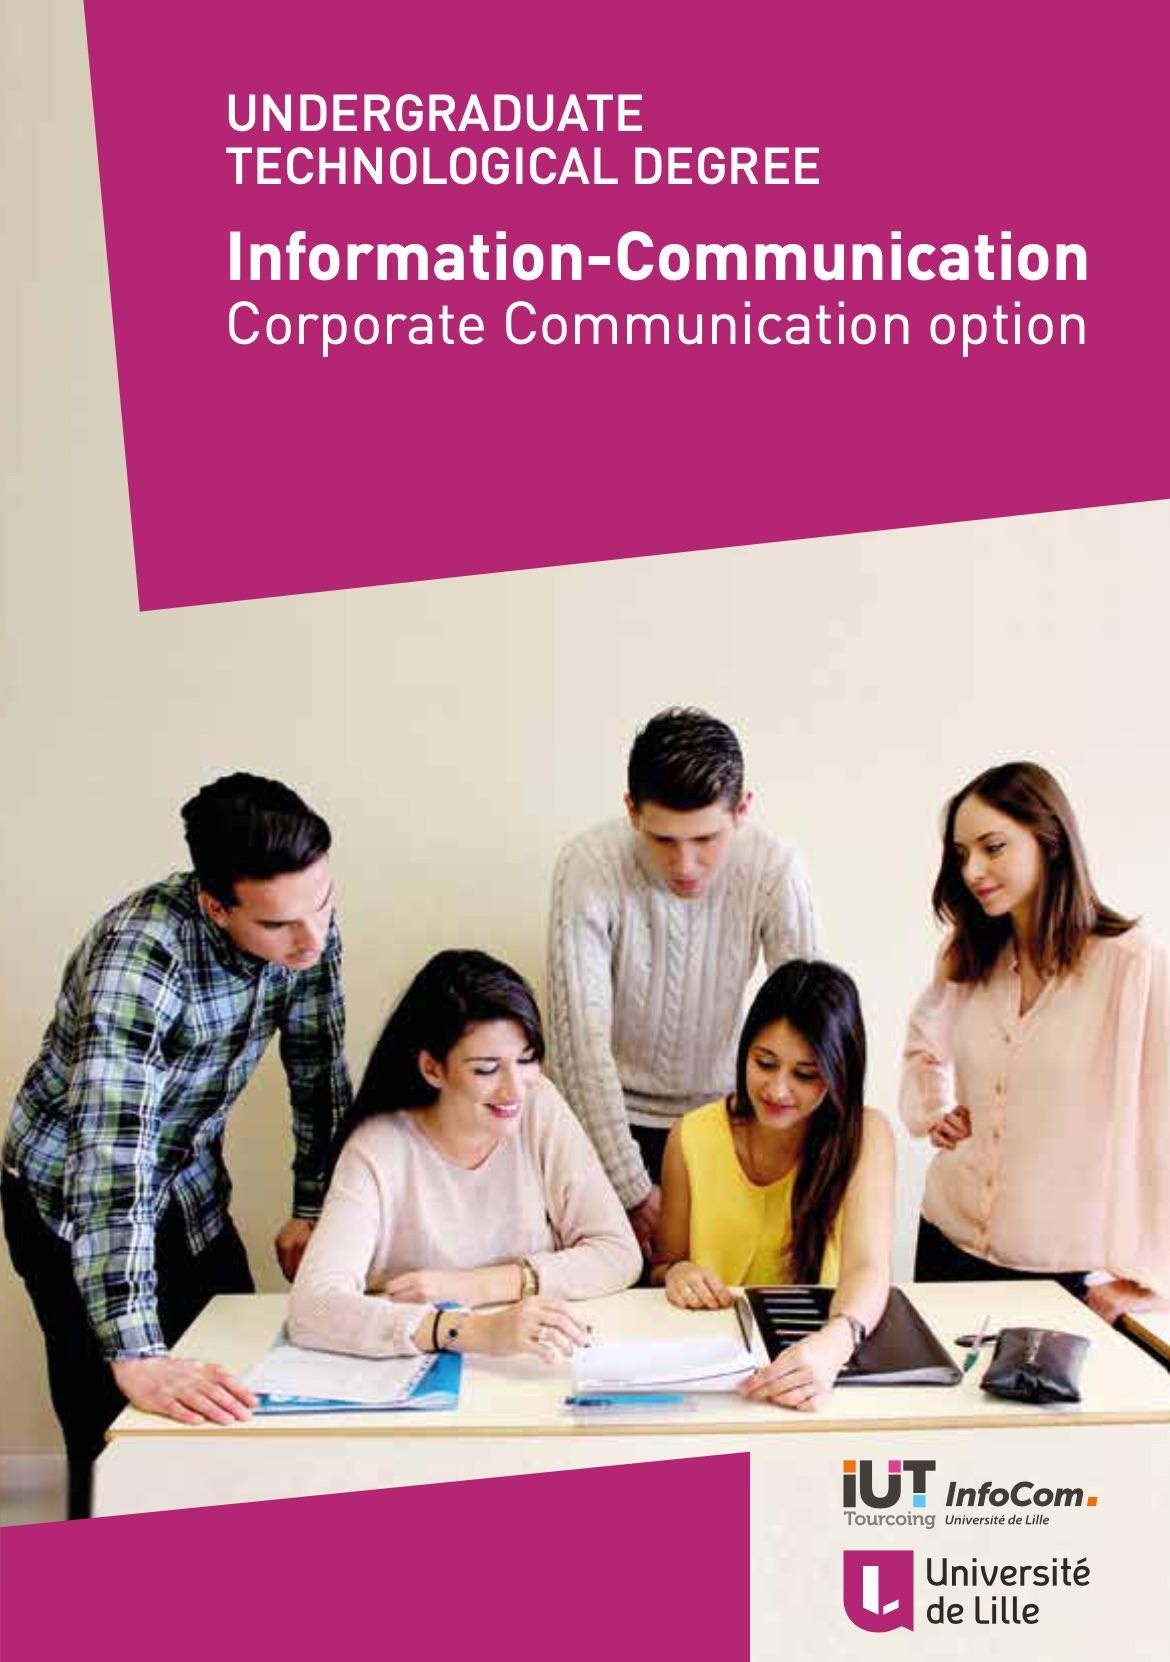 Undergraduate Technological Degree Information-Communication